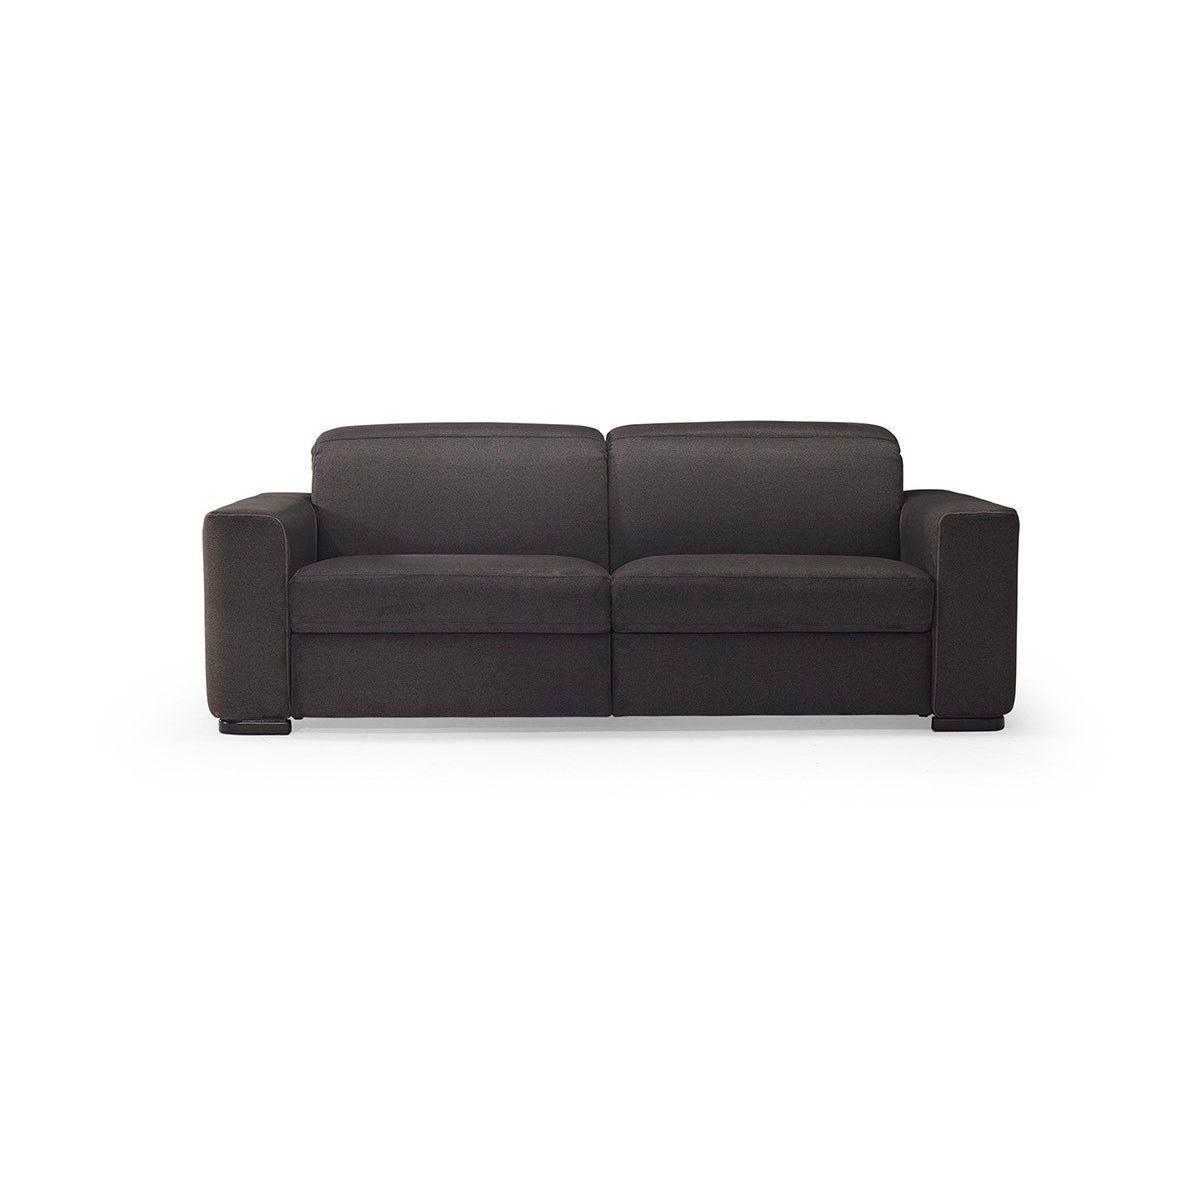 Sofa bed / contemporary / leather / fabric - DIESIS - NATUZZI - Videos